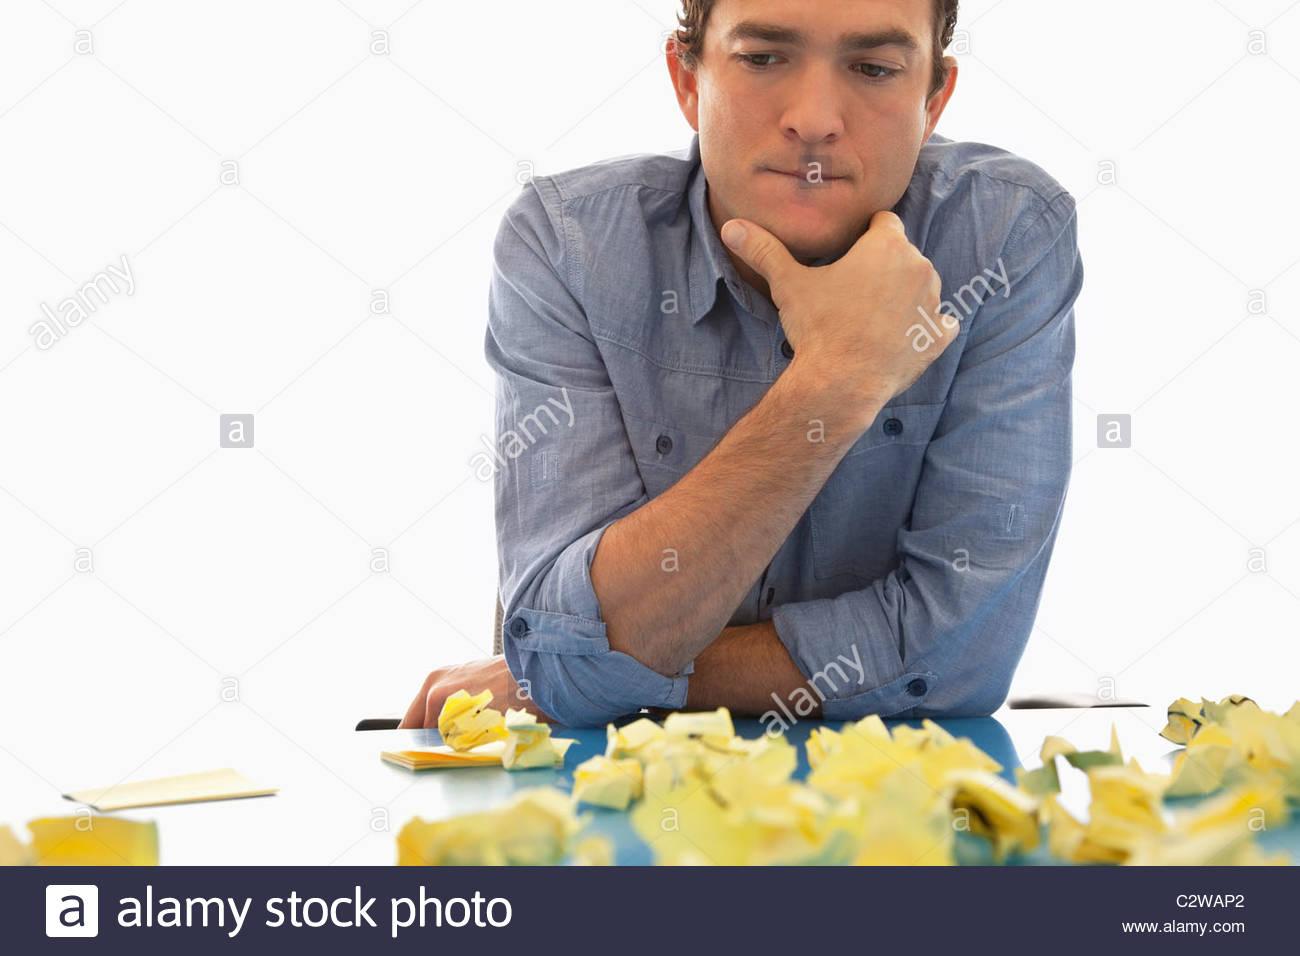 Businessman looking at crumpled adhesive notes - Stock Image